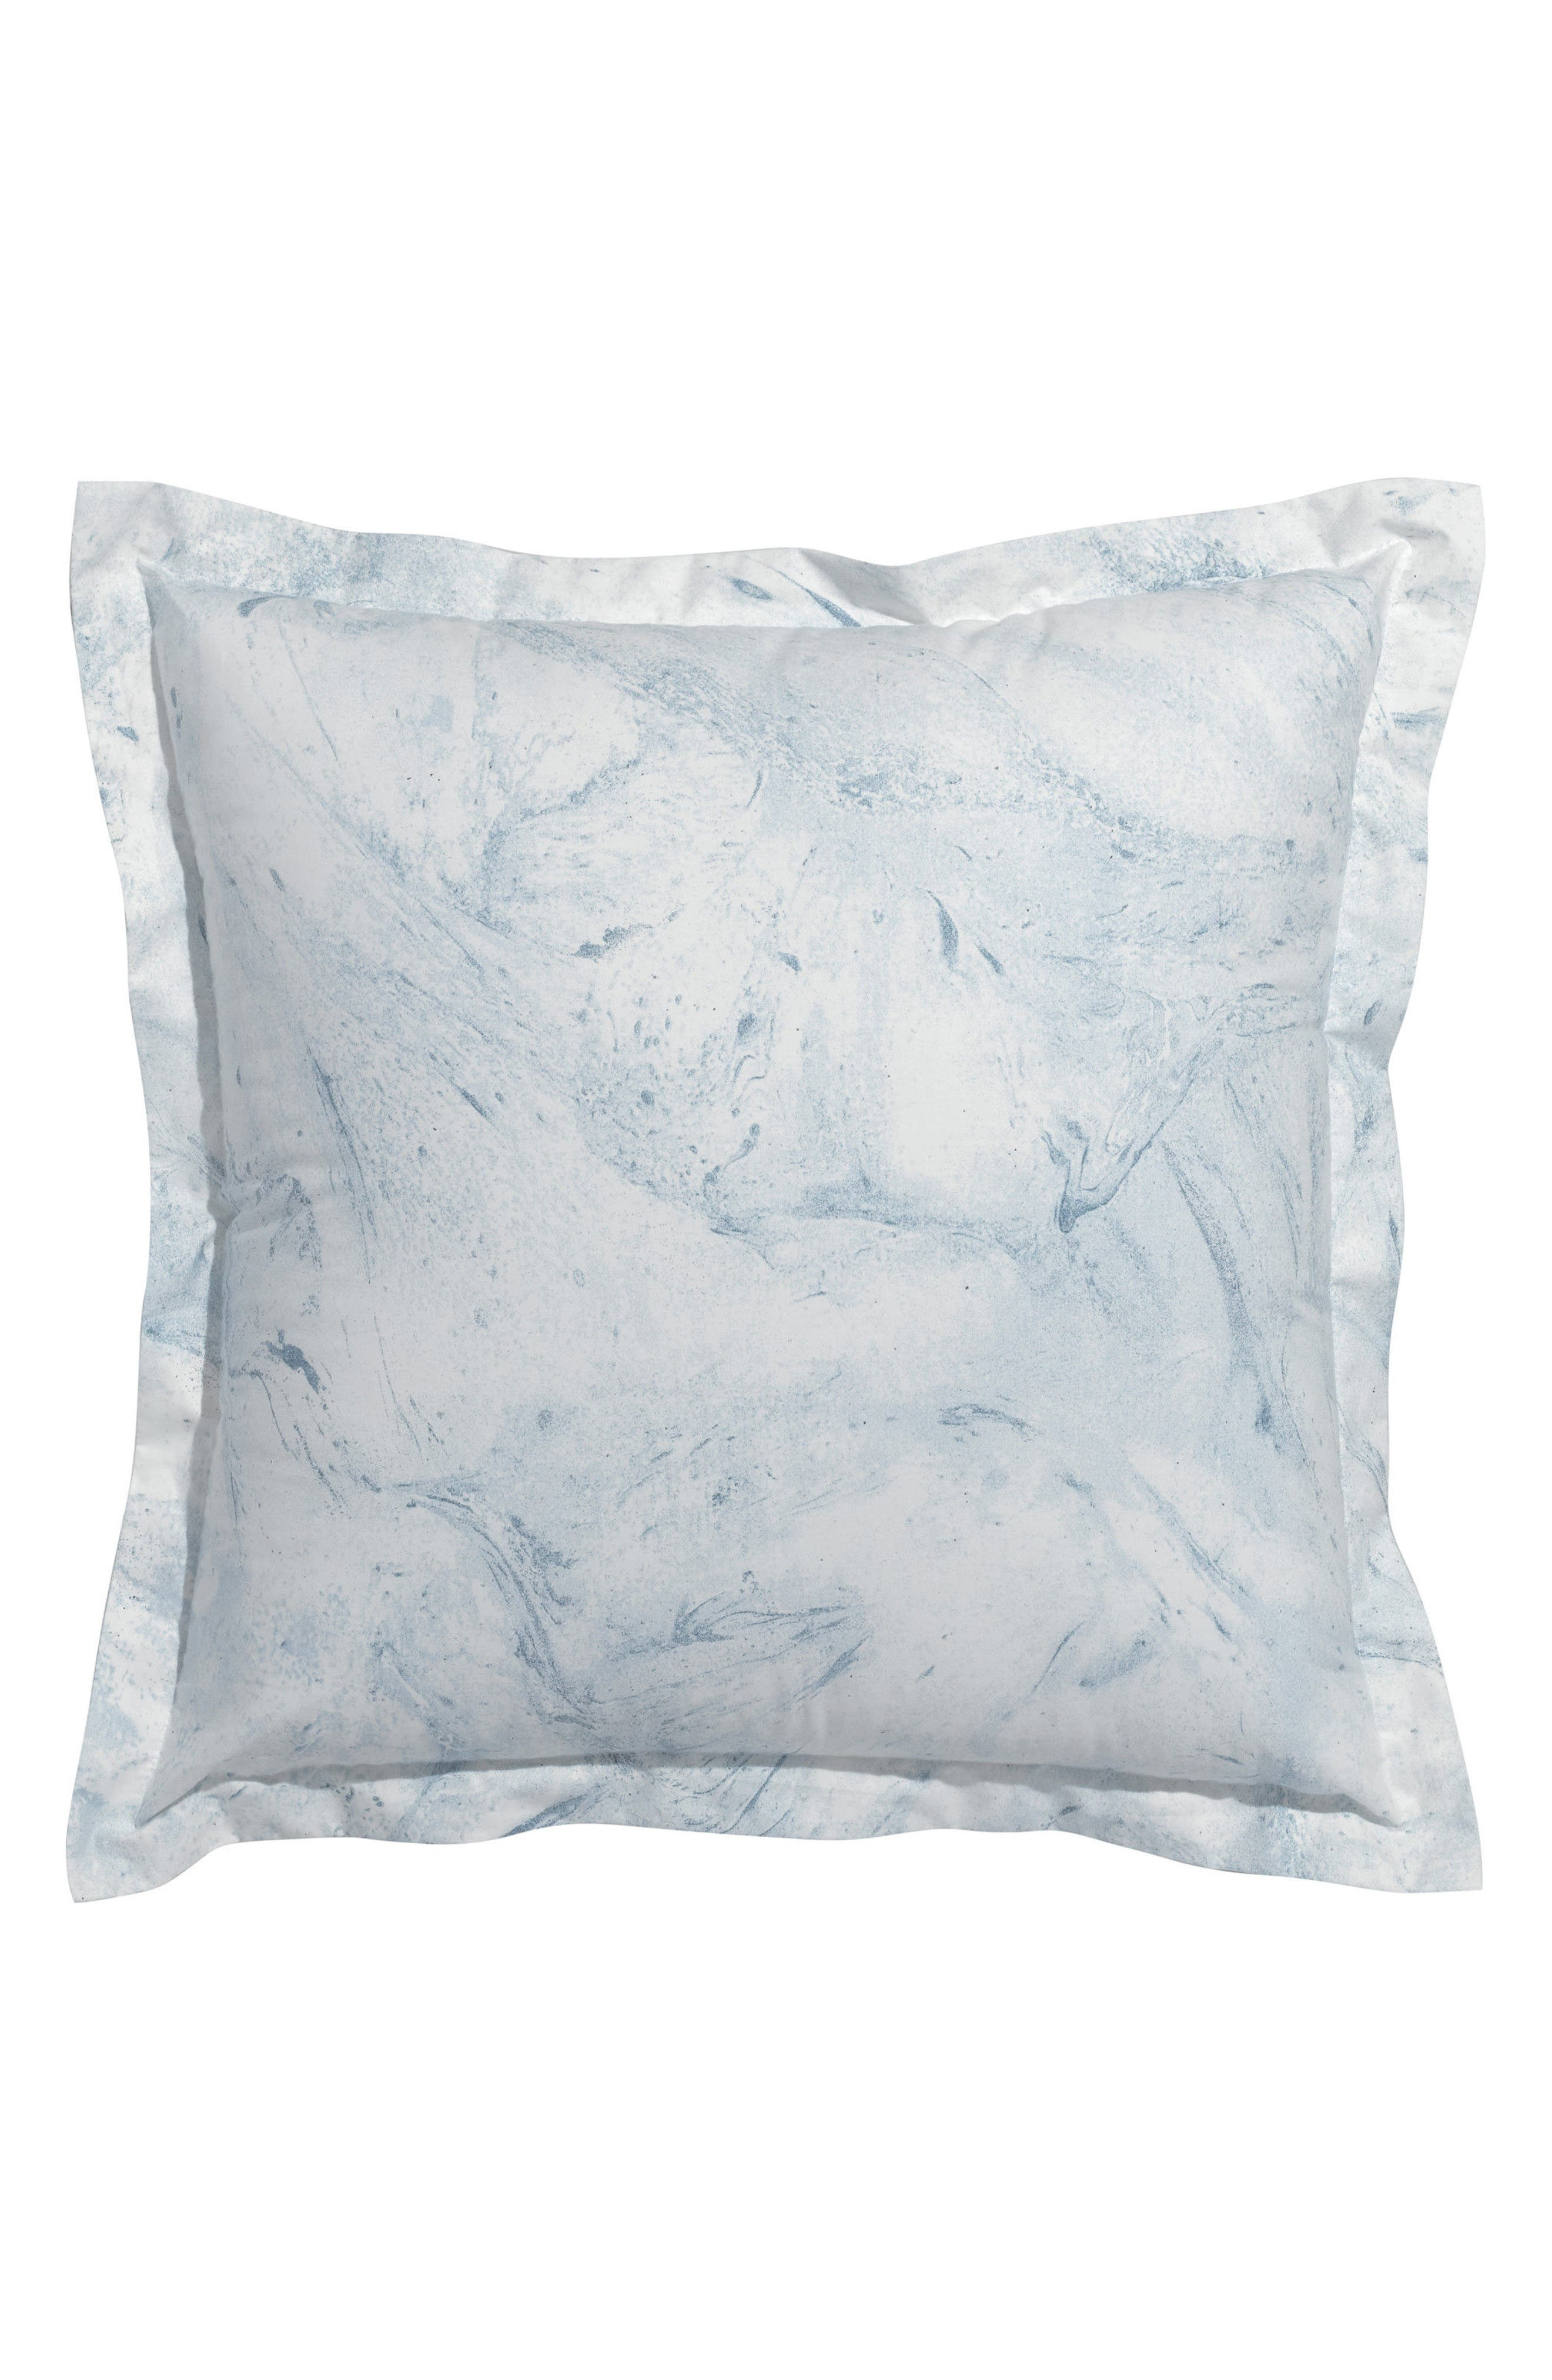 Glacier Bay Square Organic Cotton Accent Pillow,                             Main thumbnail 1, color,                             400